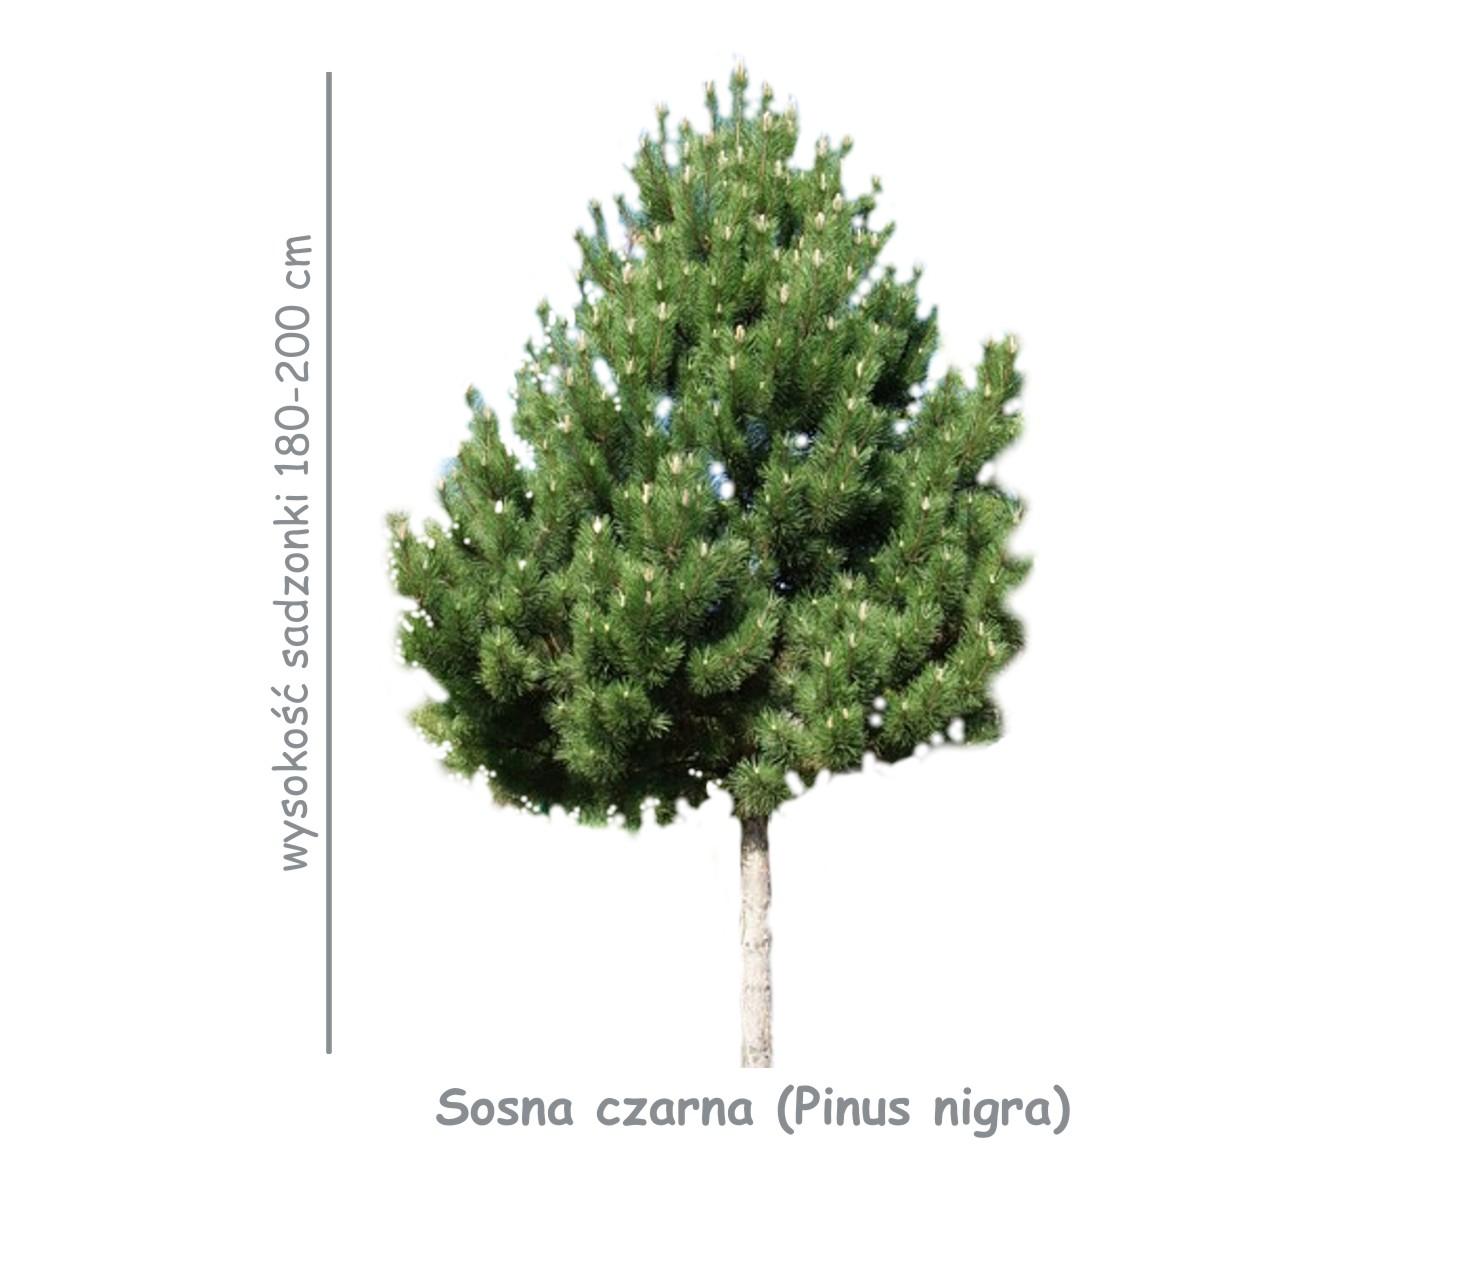 Sosna czarna (Pinus nigra) wysokość sadzonki 180-200 cm